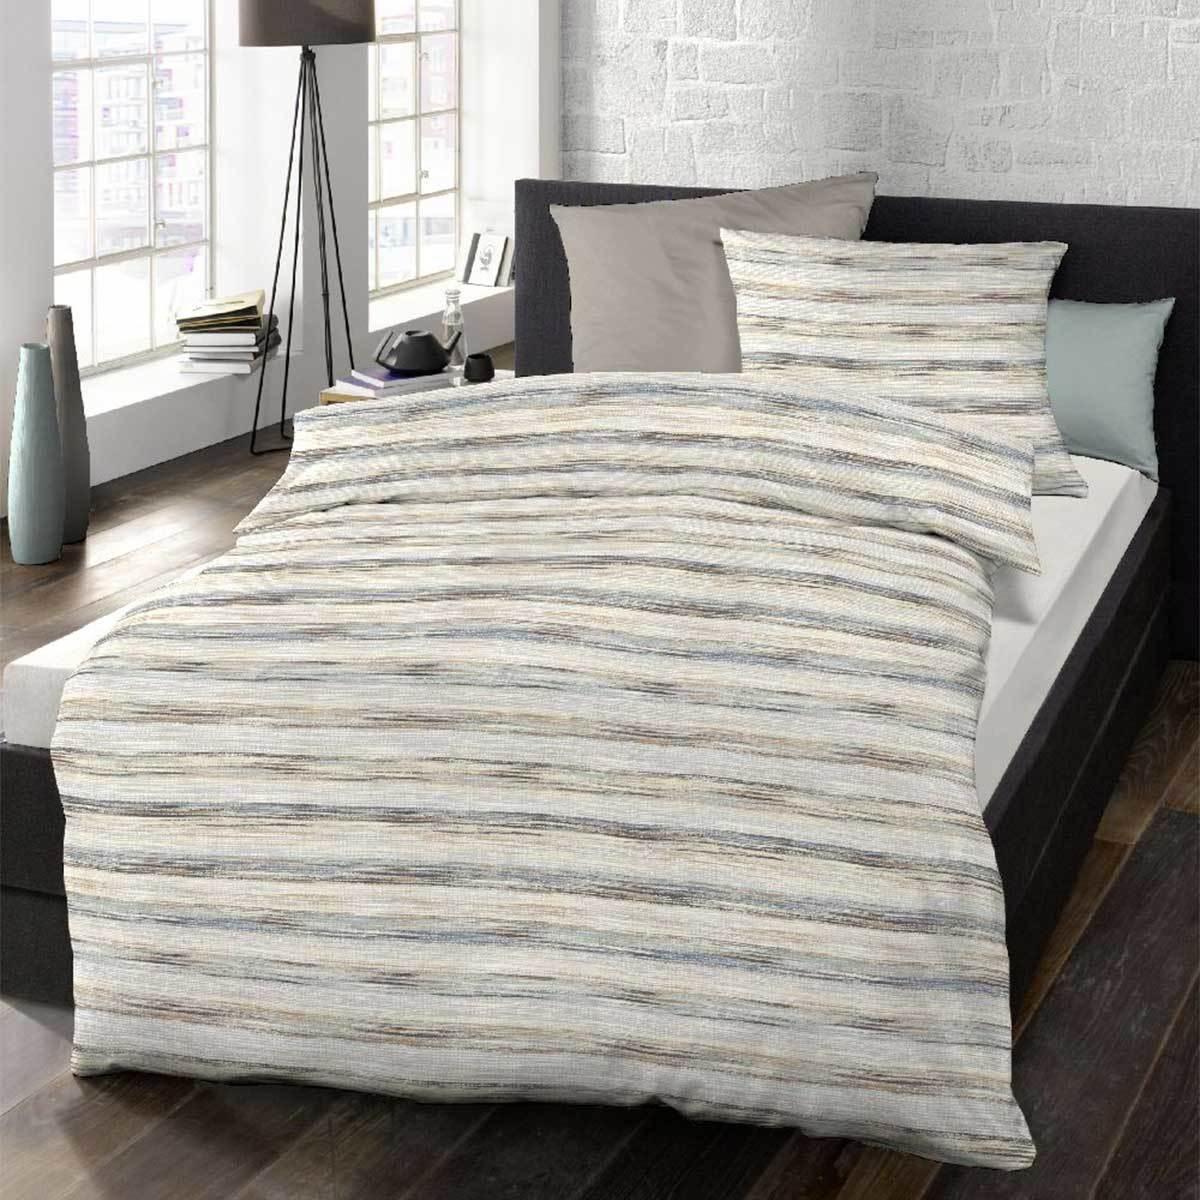 schlafgut soft touch cotton bettw sche maxwell tiramisu. Black Bedroom Furniture Sets. Home Design Ideas